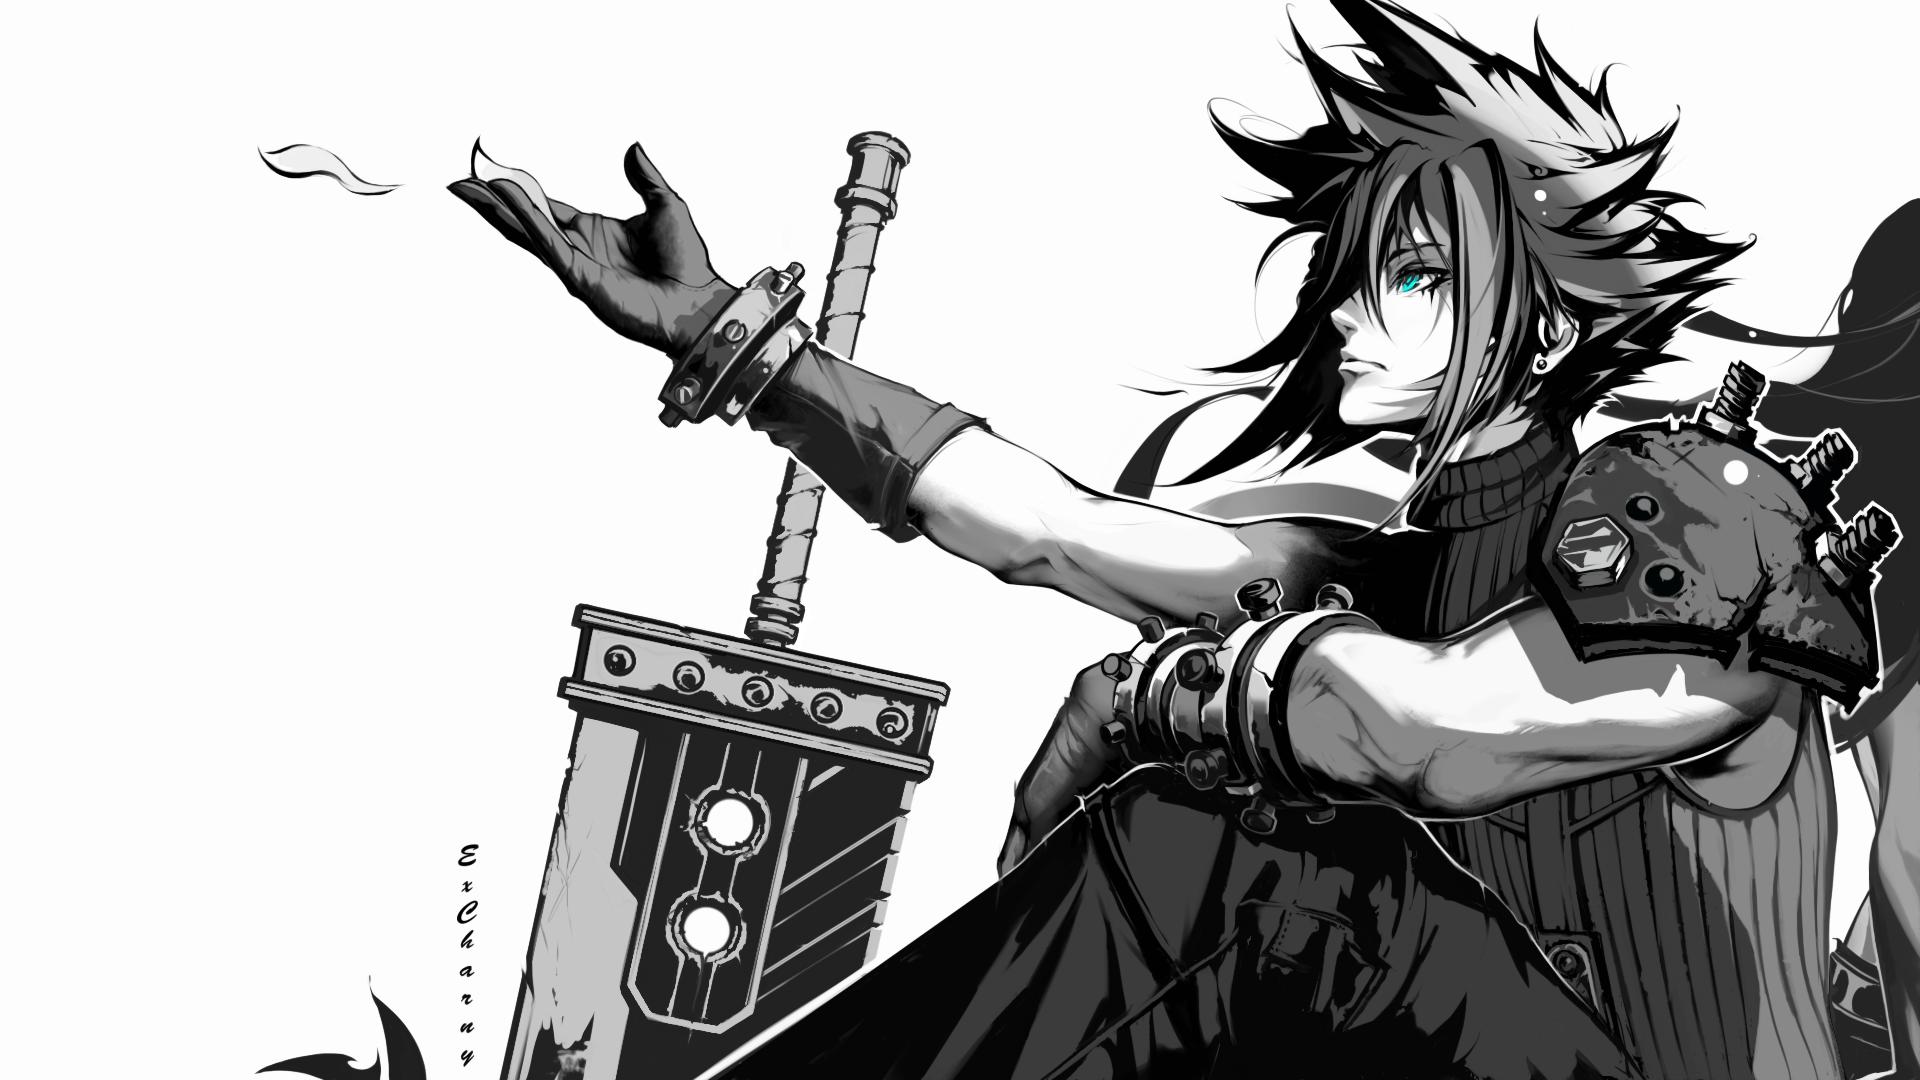 Anxious Heart [ Final Fantasy 7 Remake fanart ]